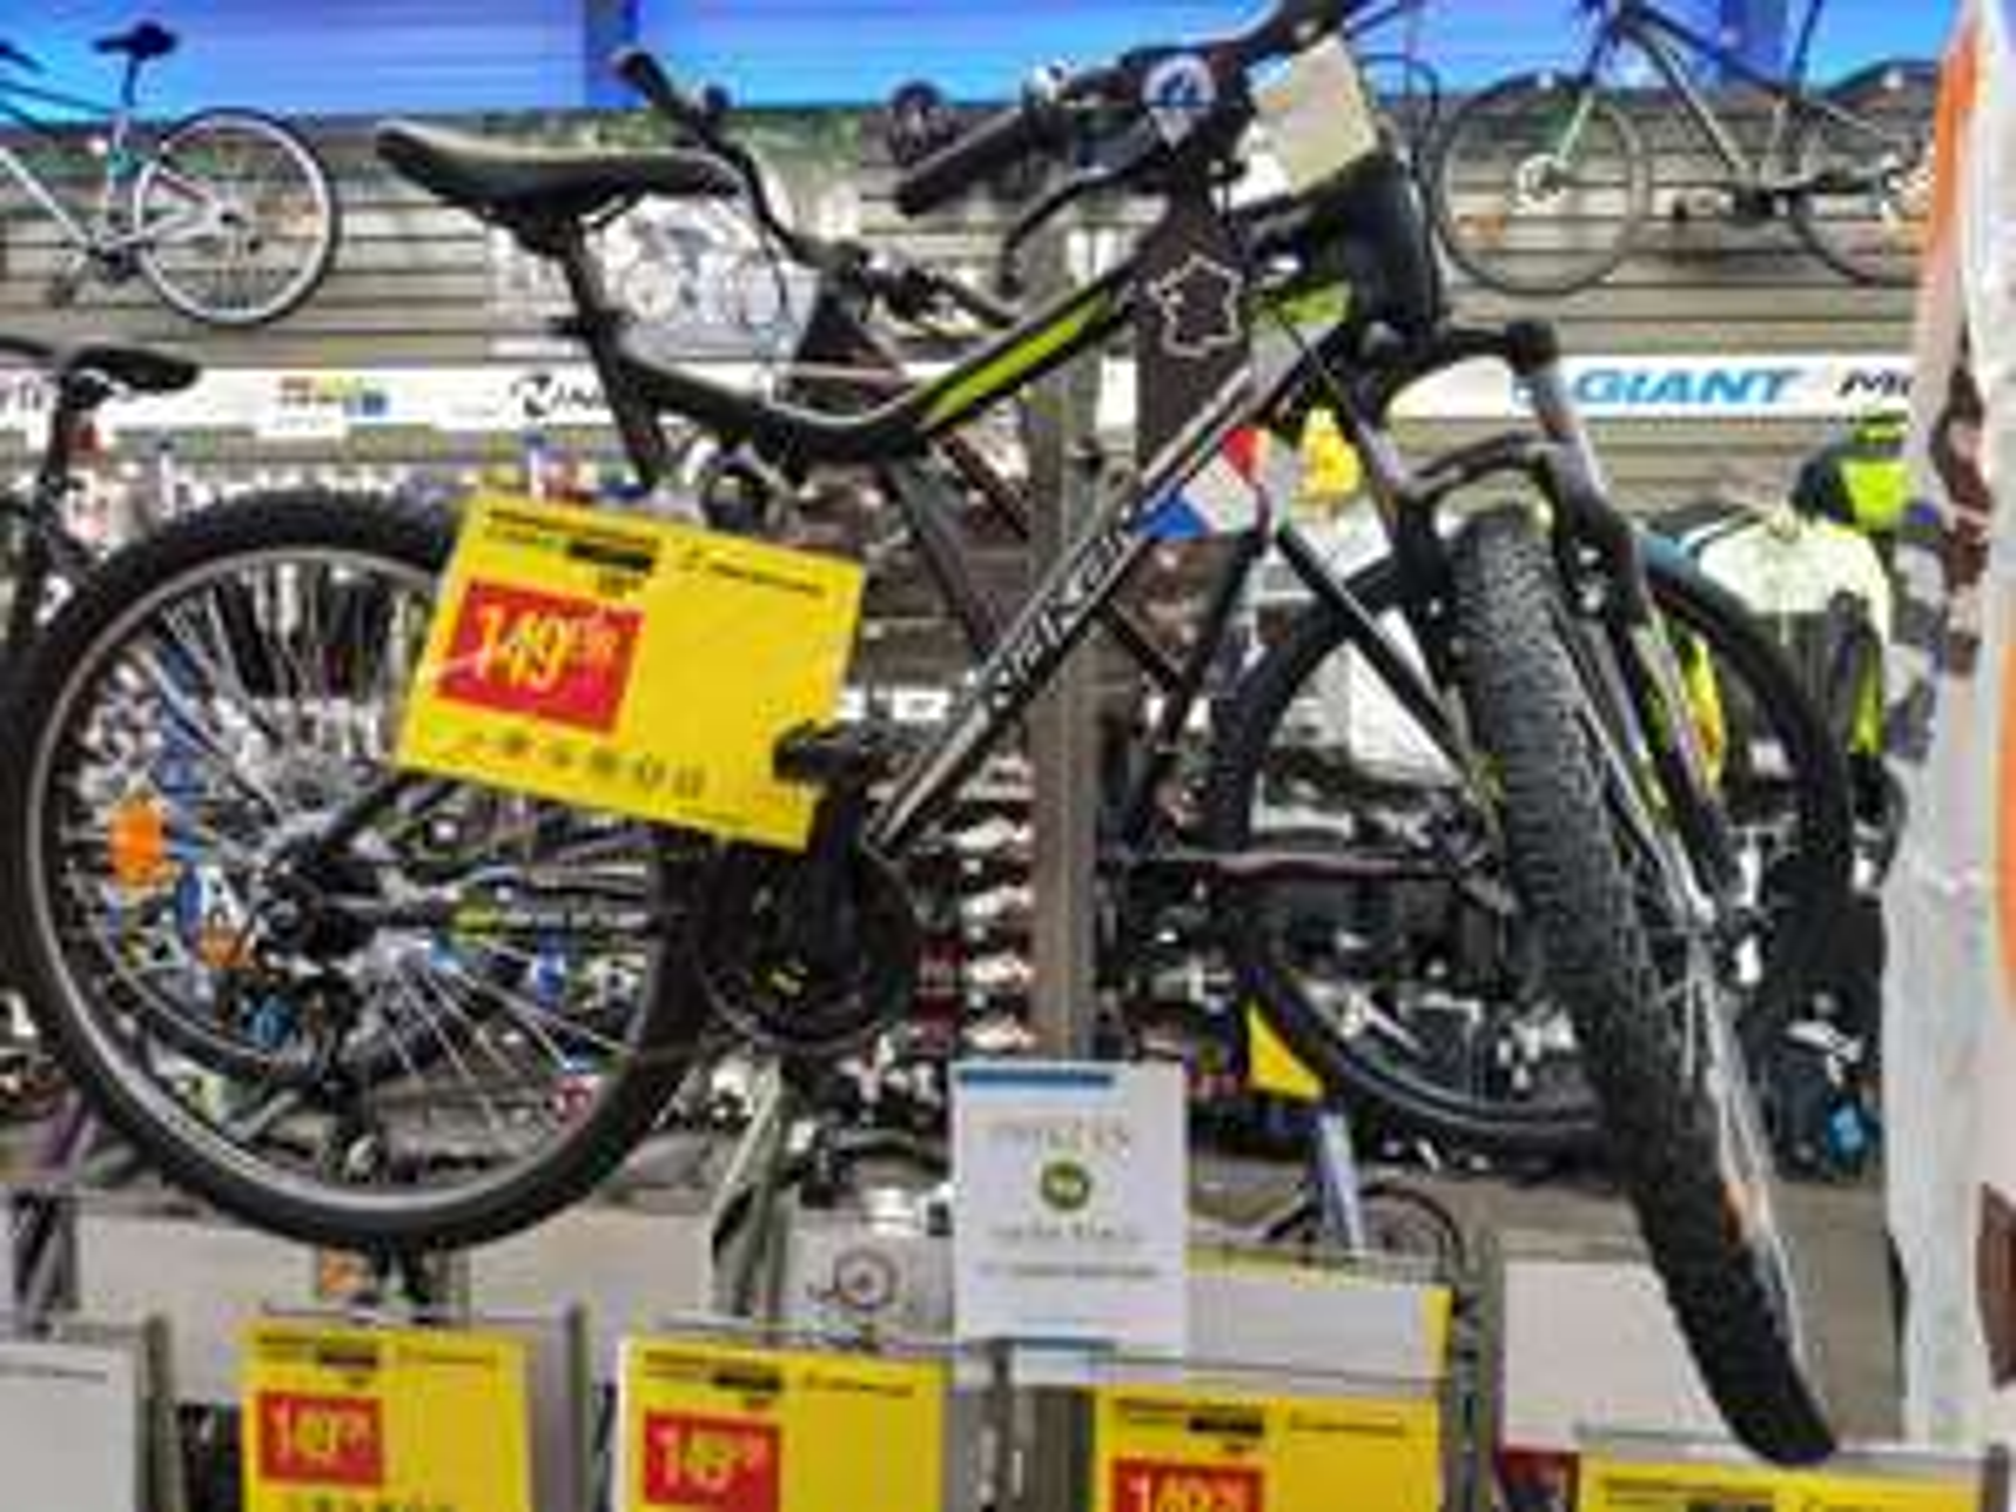 "Vélo 26"" Nakamura Cliff 610 - Angers (49) Intersport Atoll"